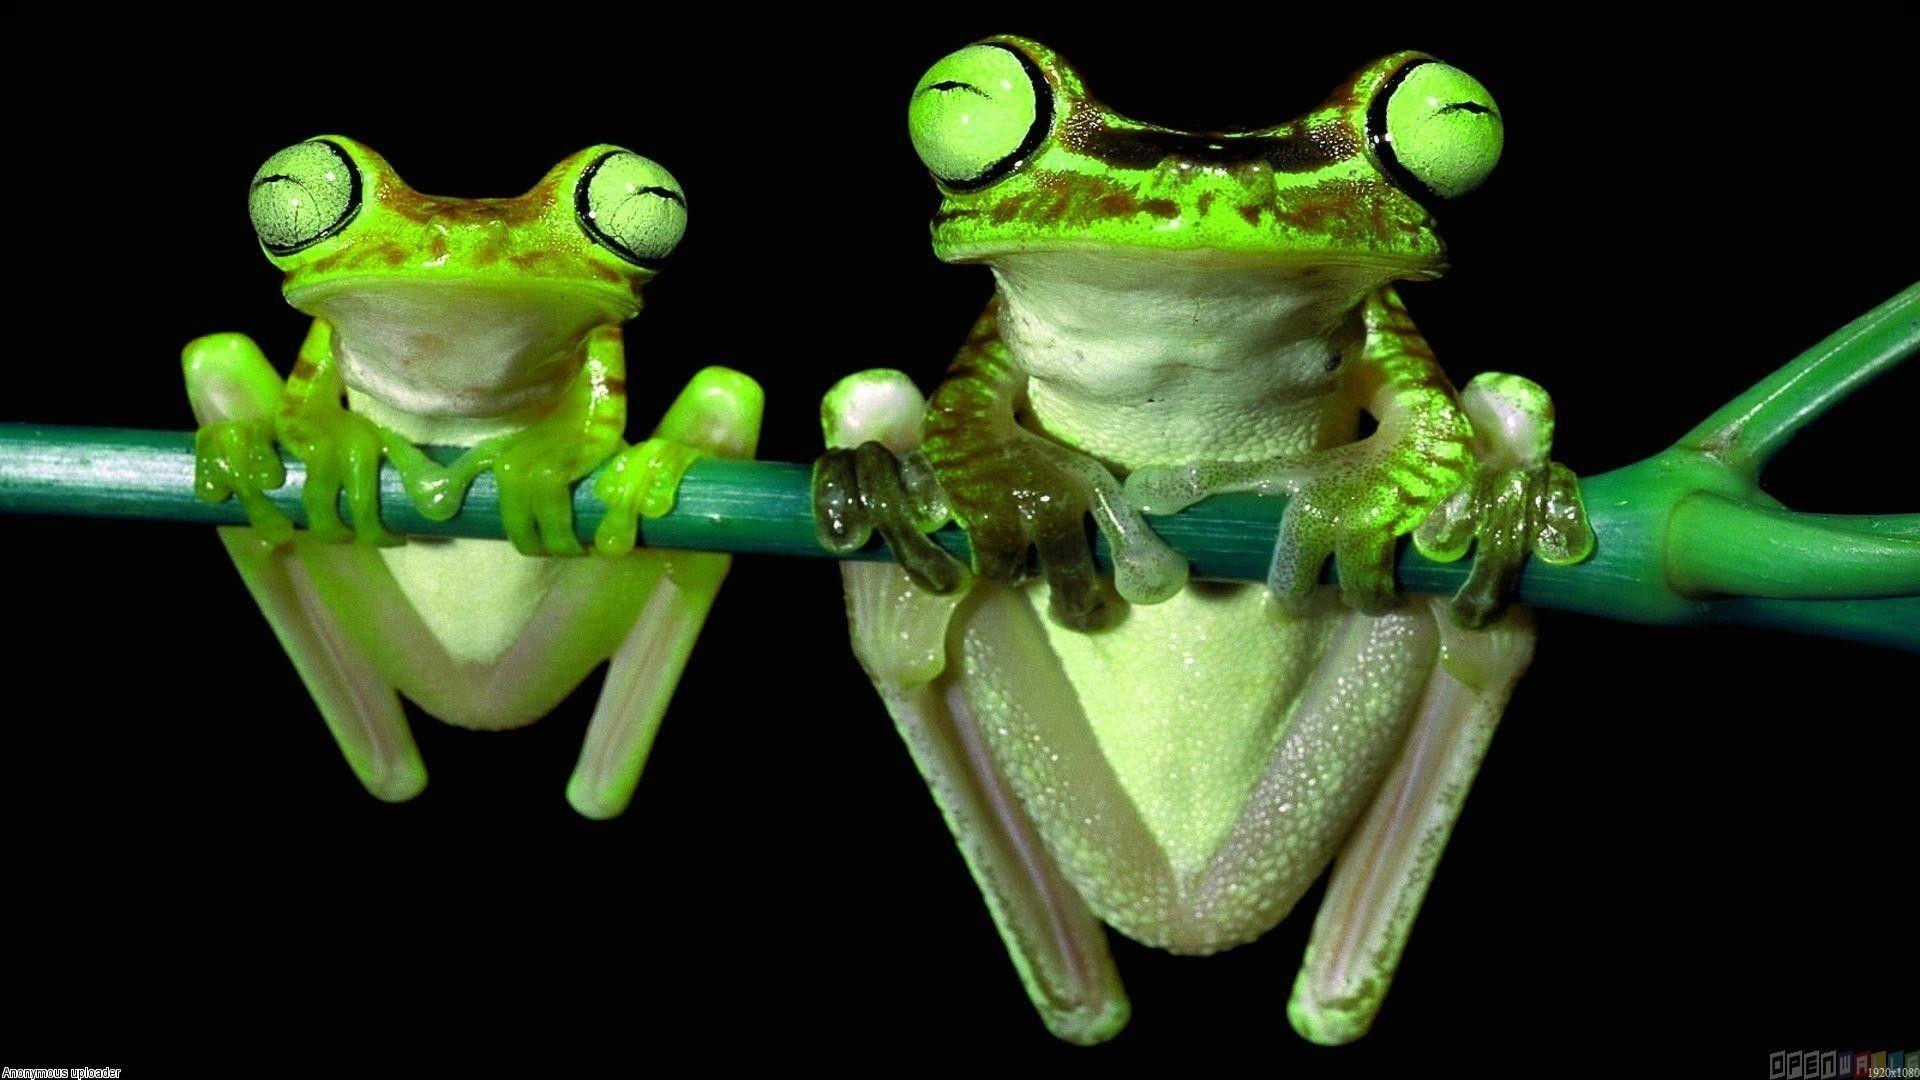 Cartoon frog wallpaper 46 images - Frog cartoon wallpaper ...